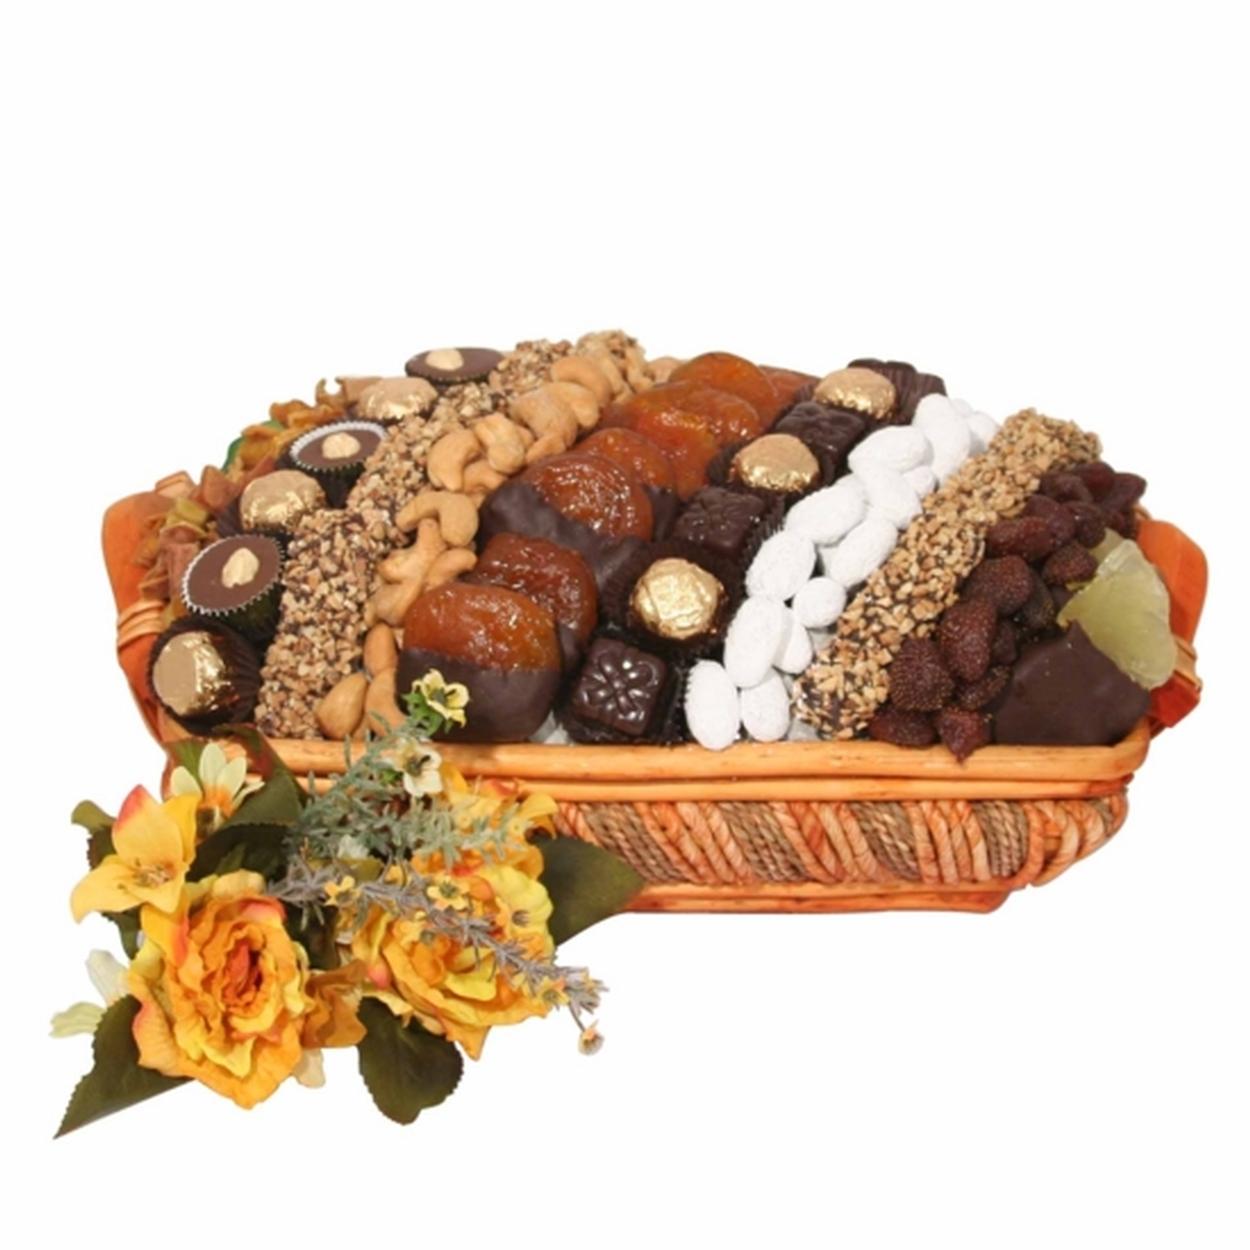 Large Israeli Chocolate, Dried Fruit & Nut Basket - Israel Only